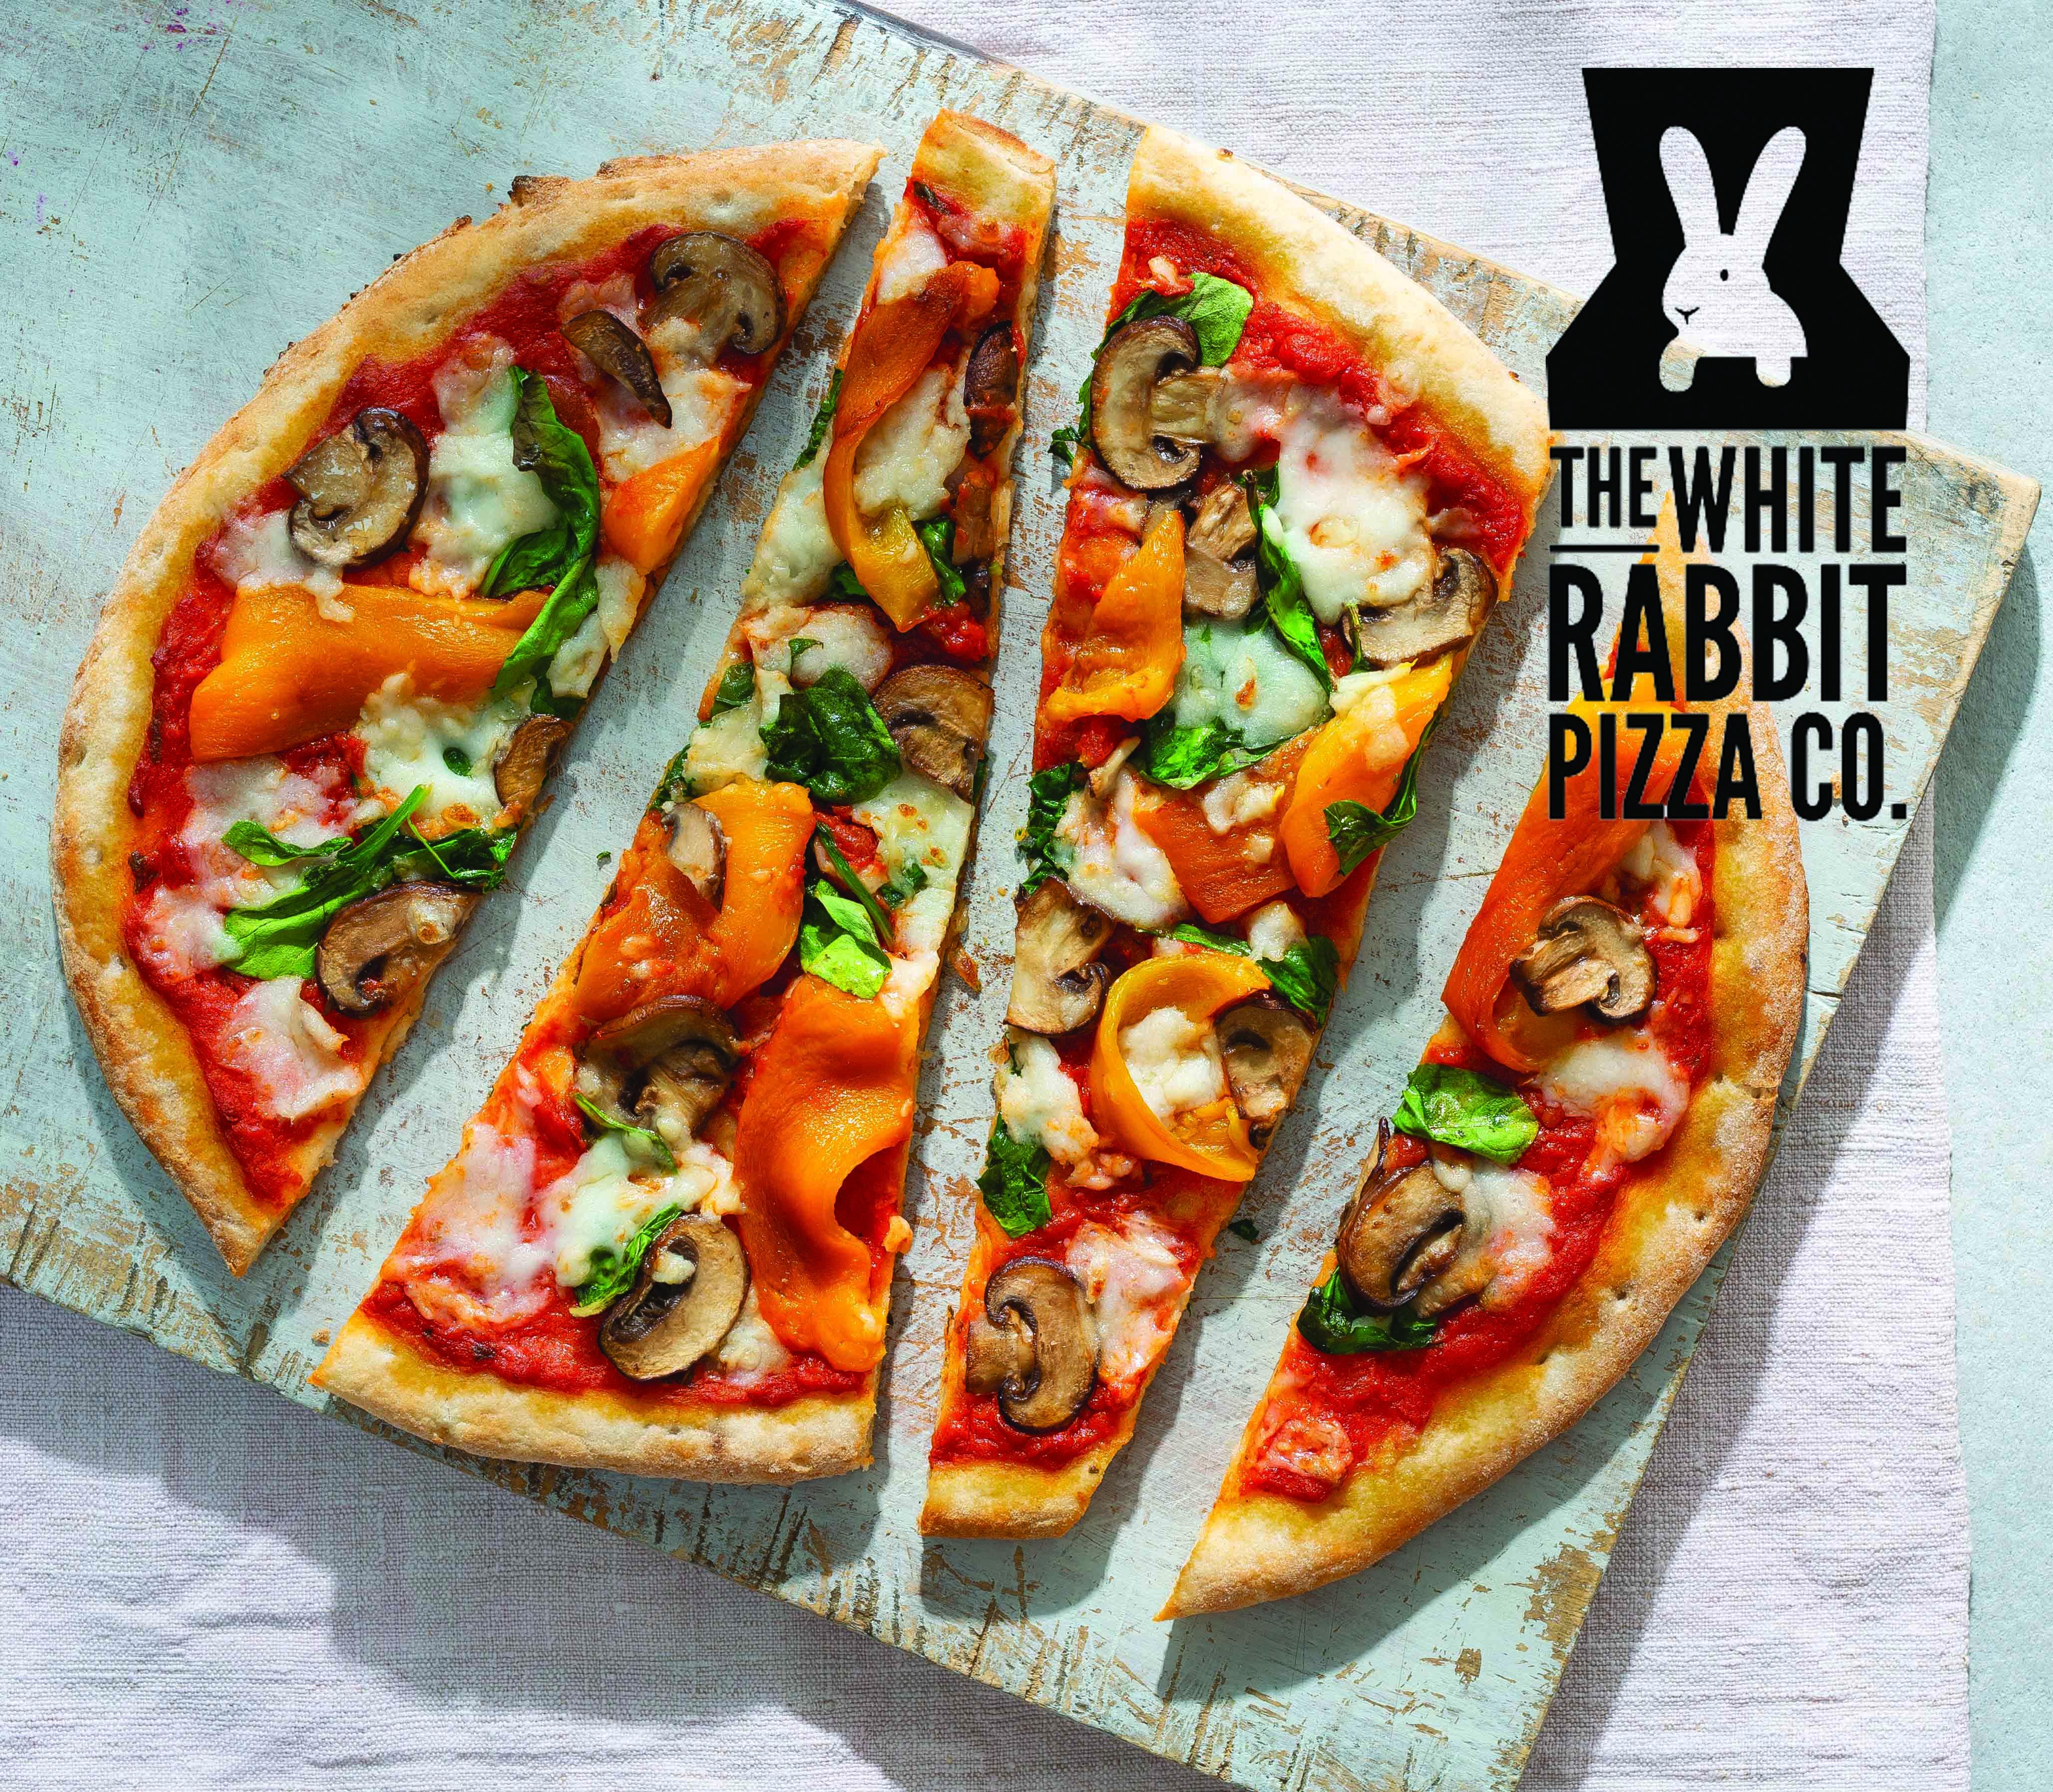 In the spotlight... The White Rabbit Pizza Co.